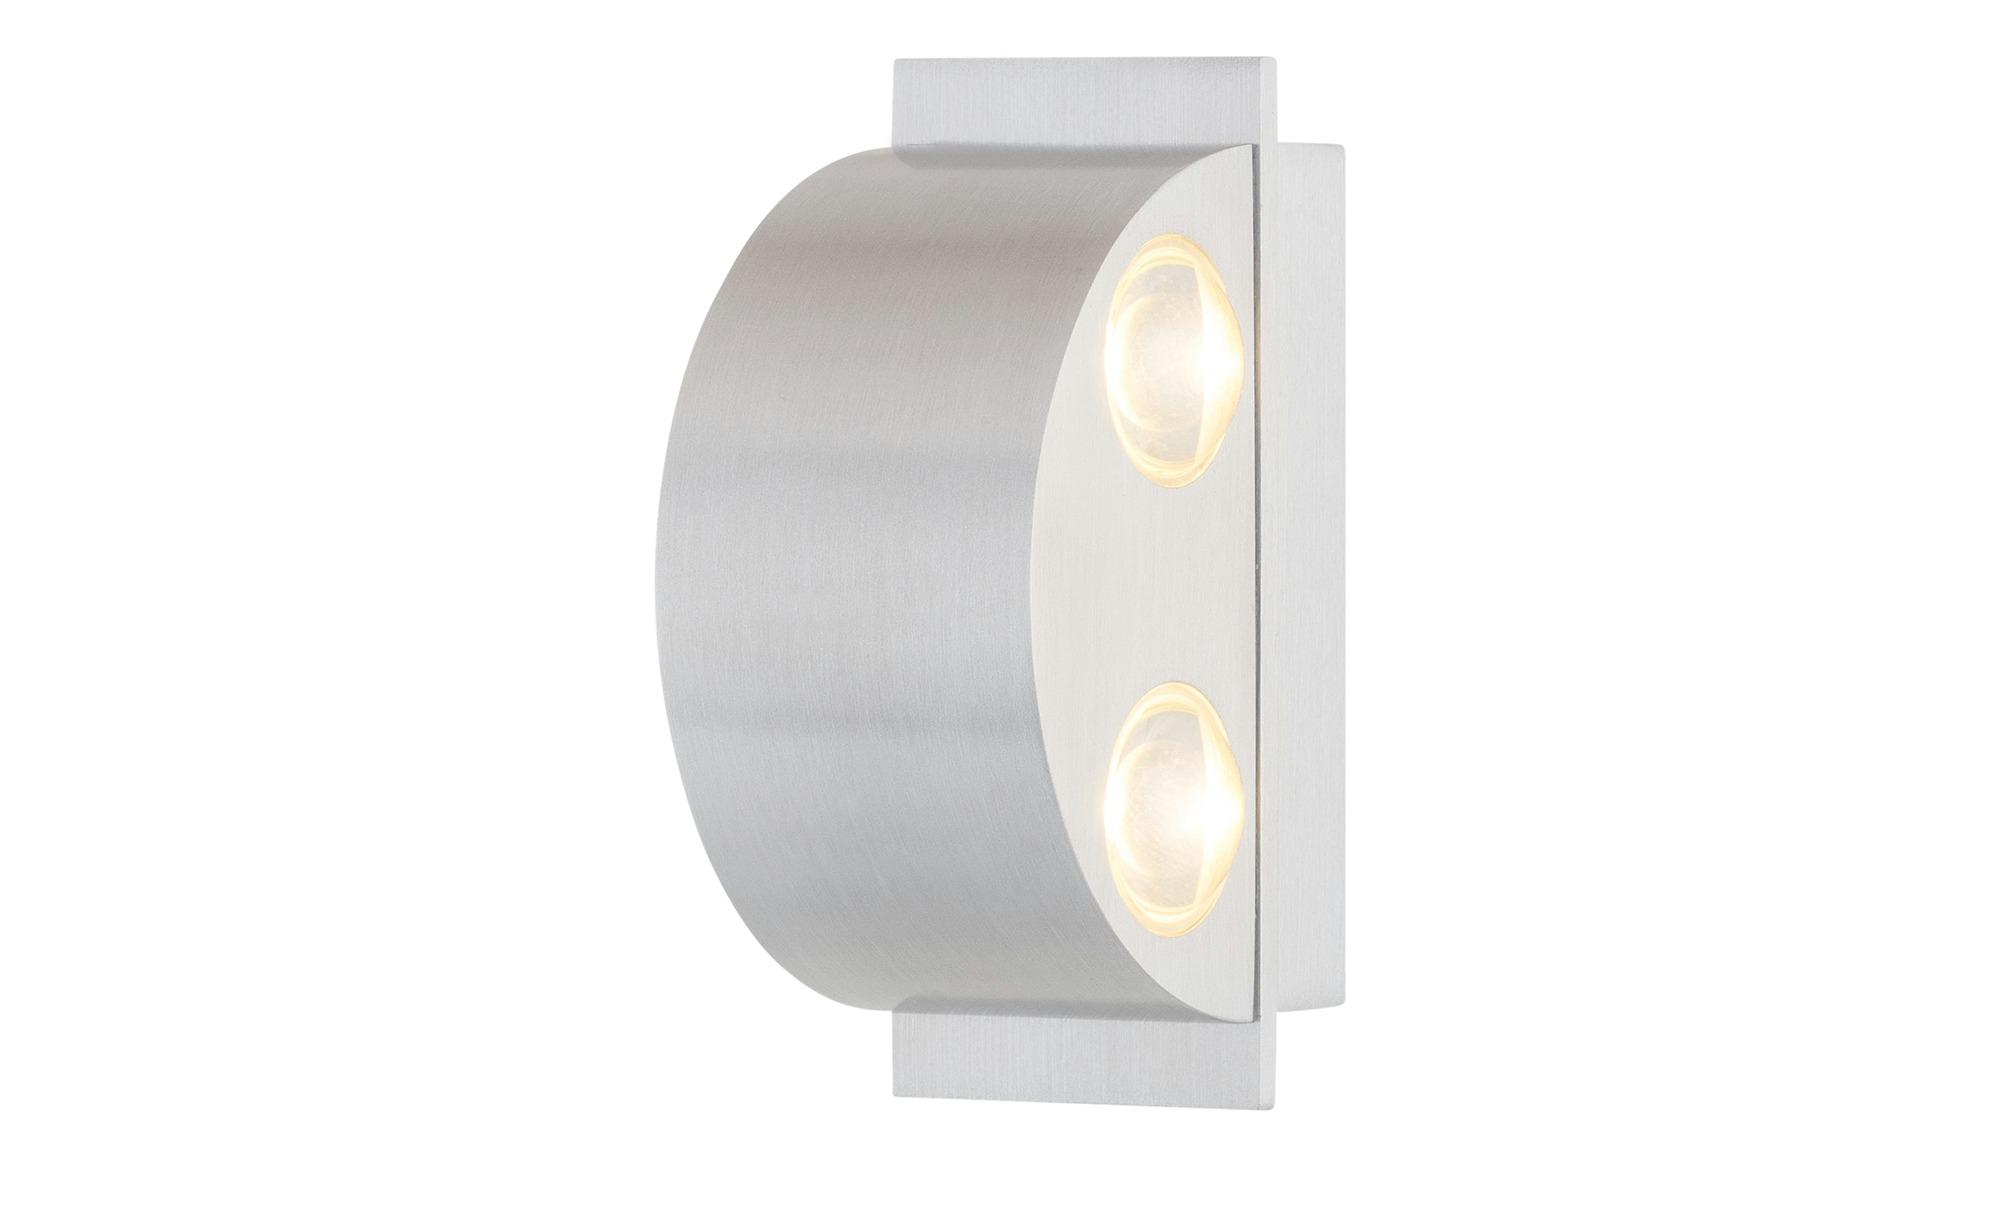 LED-Wandleuchte Aluminium halbrund ¦ silber ¦ Maße (cm): B: 12 H: 5 Lampen & Leuchten > Innenleuchten > Wandleuchten - Höffner